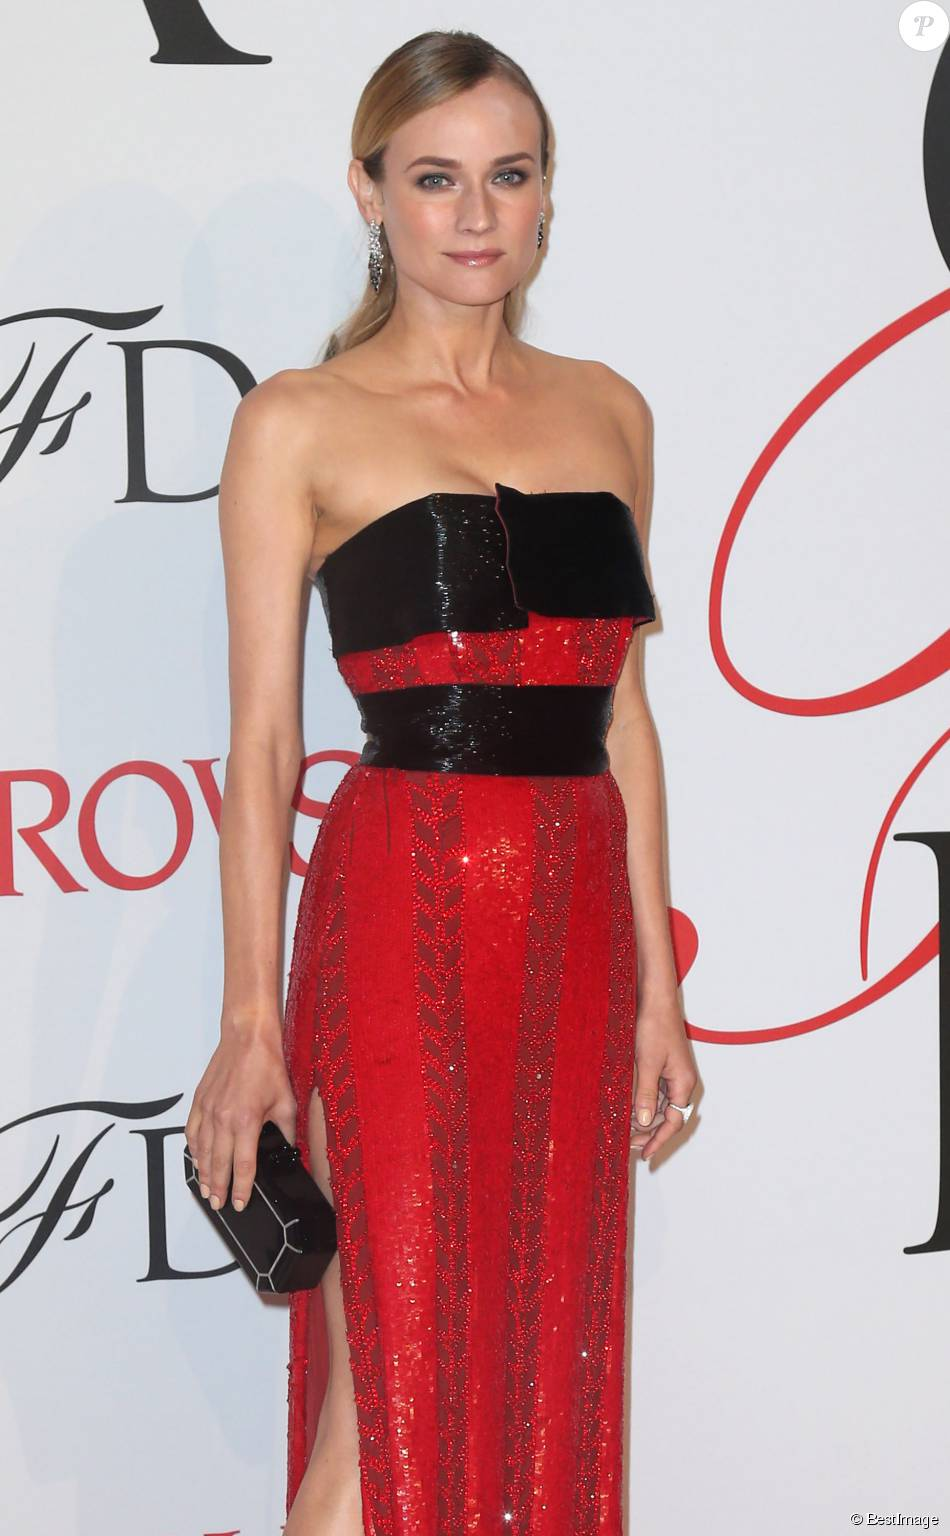 Diane Kruger - People à la soirée des CFDA Fashion Awards 2015 à New York, le 1er juin 2015.